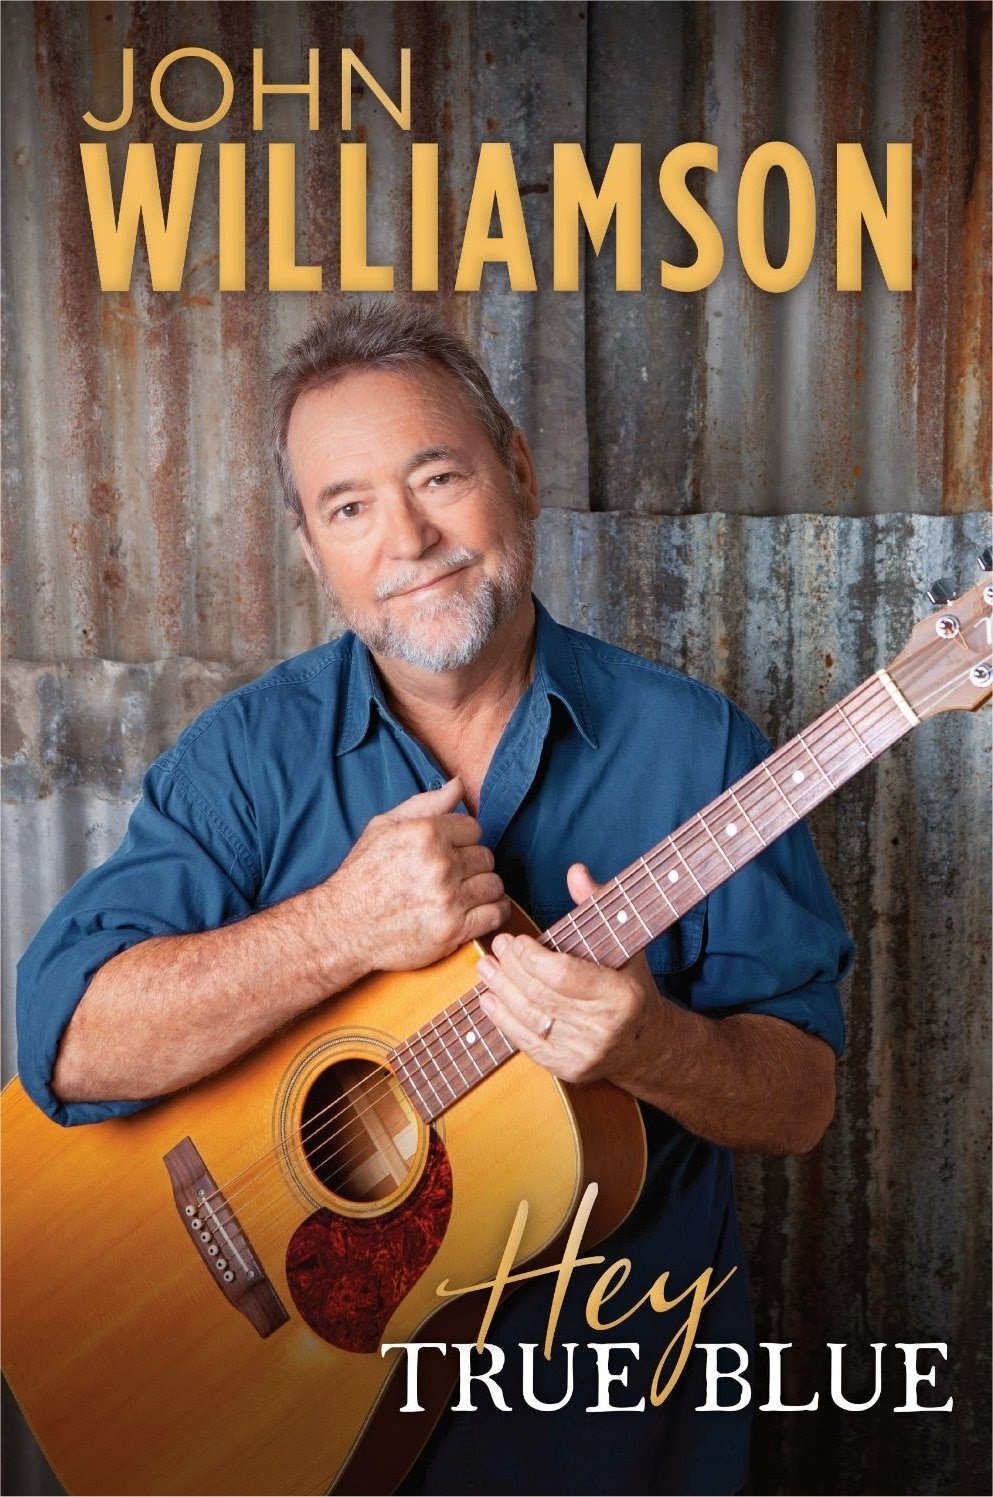 Rock On Vinyl: W.O.C.K On Vinyl - John Williamson: True ...